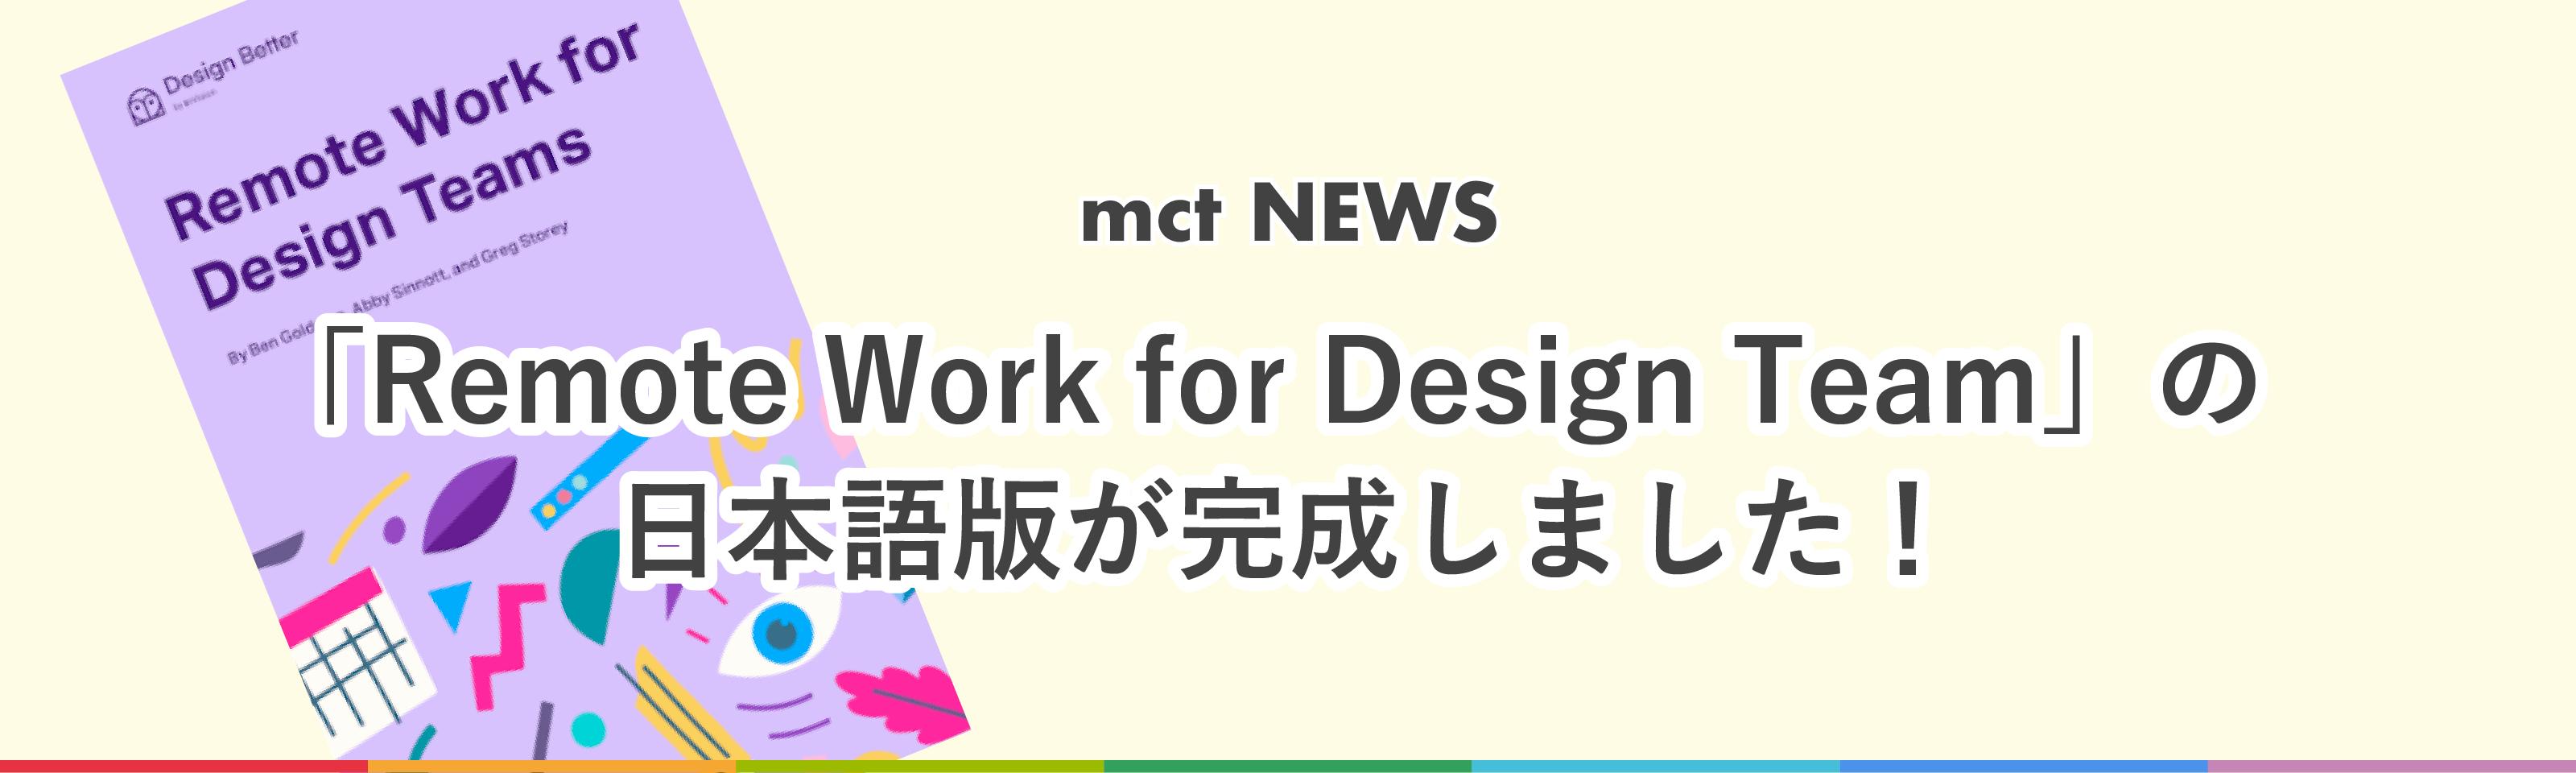 Blog|InVisionの「Remote Work for Design Team」の日本語版が完成しました!